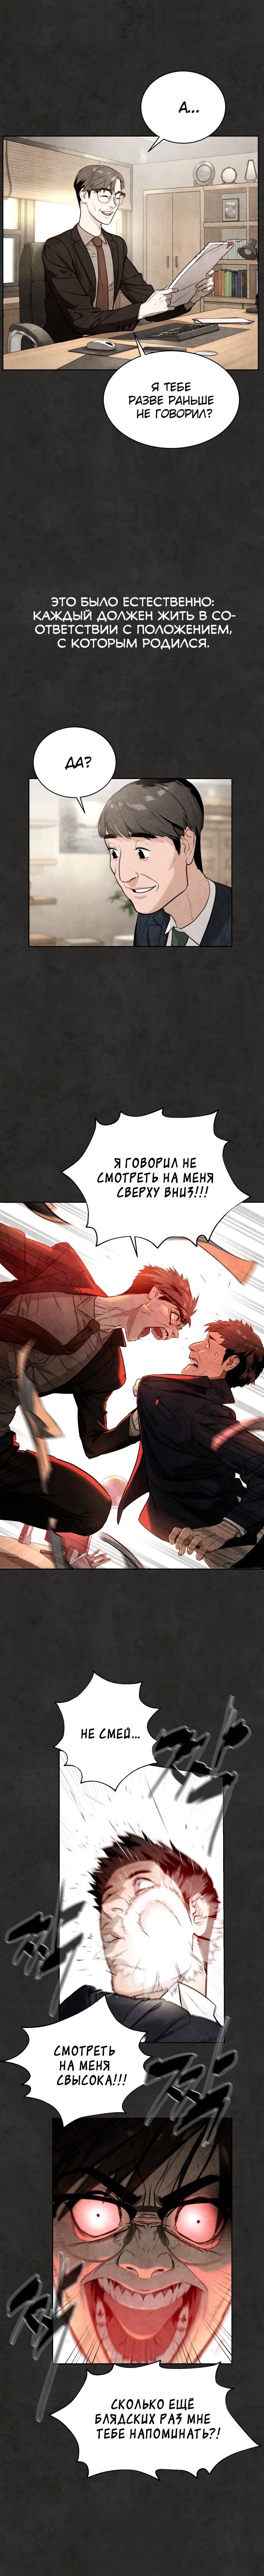 Манга Белая кровь / White Blood  - Том 1 Глава 13 Страница 9